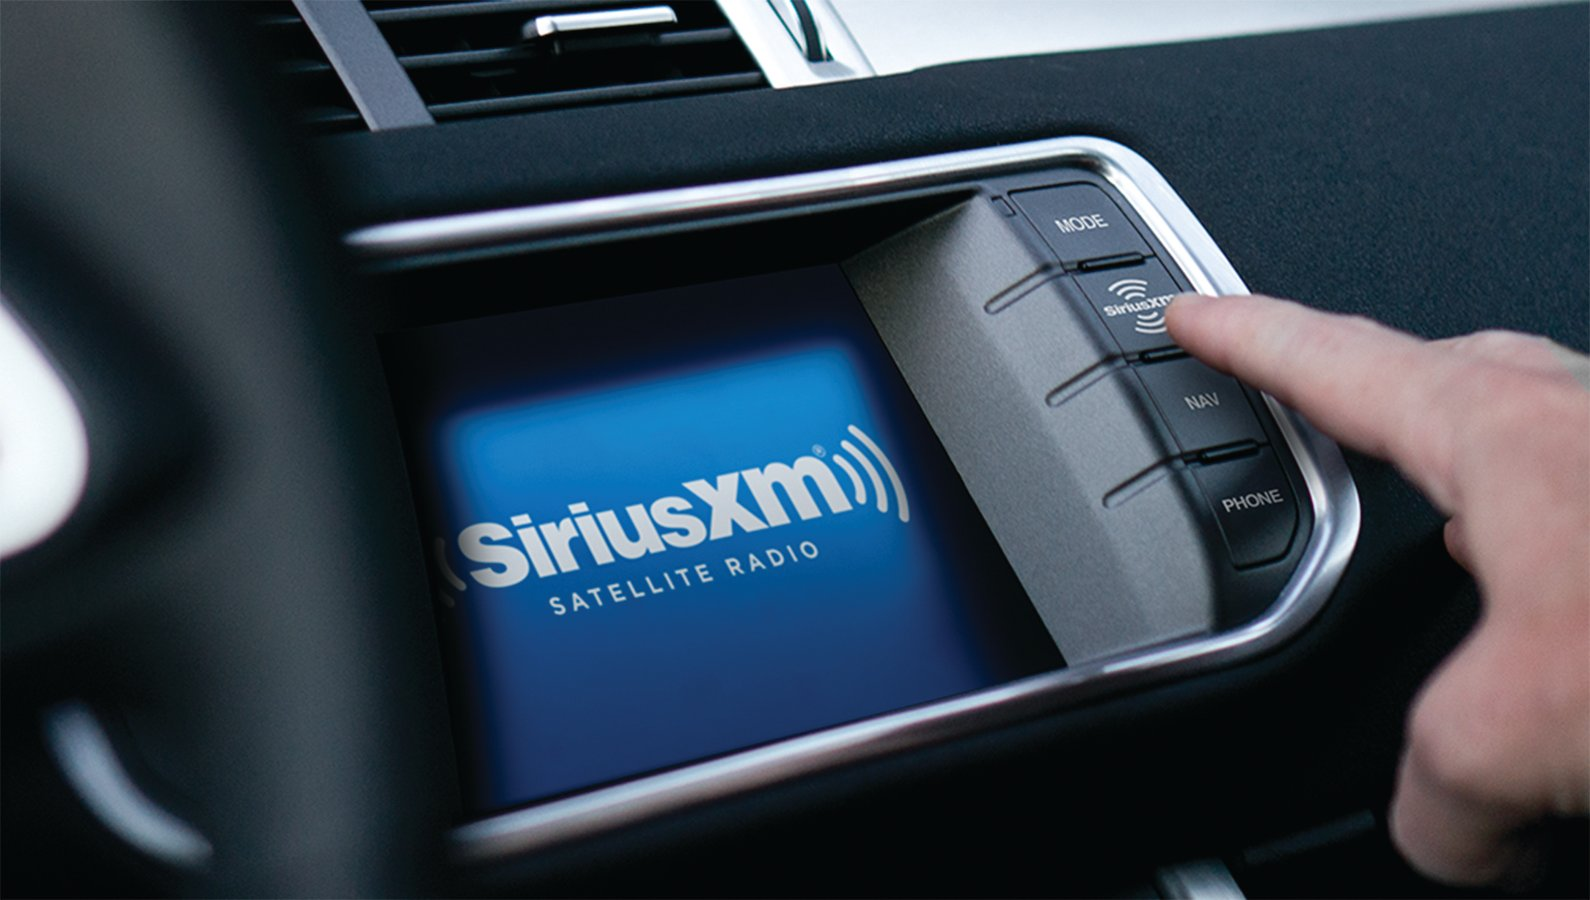 NASCAR SiriusXM Deal Extended Through 2022